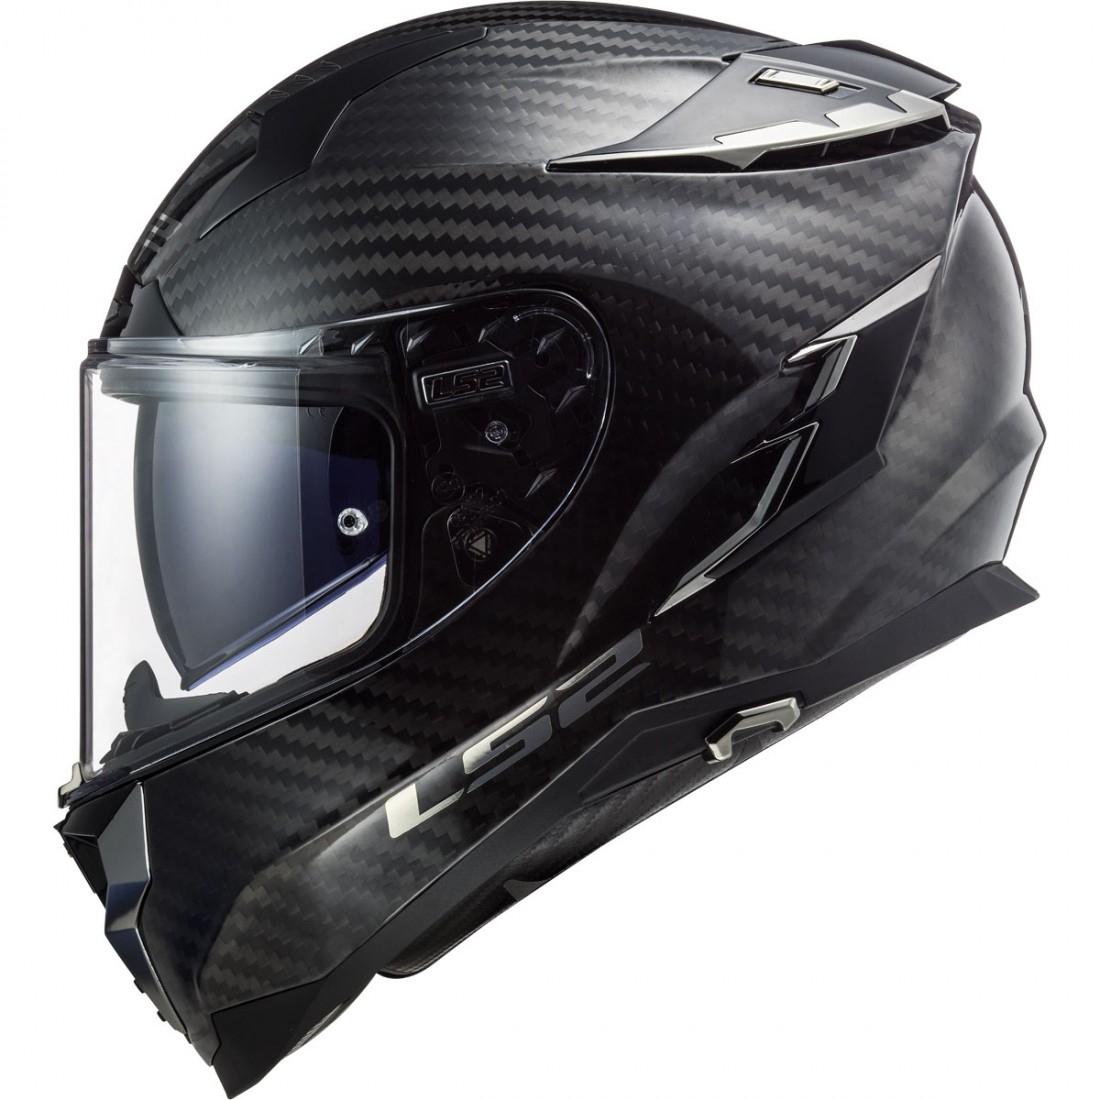 273addfc LS2 FF327 Challenger Carbon Helmet · Motocard